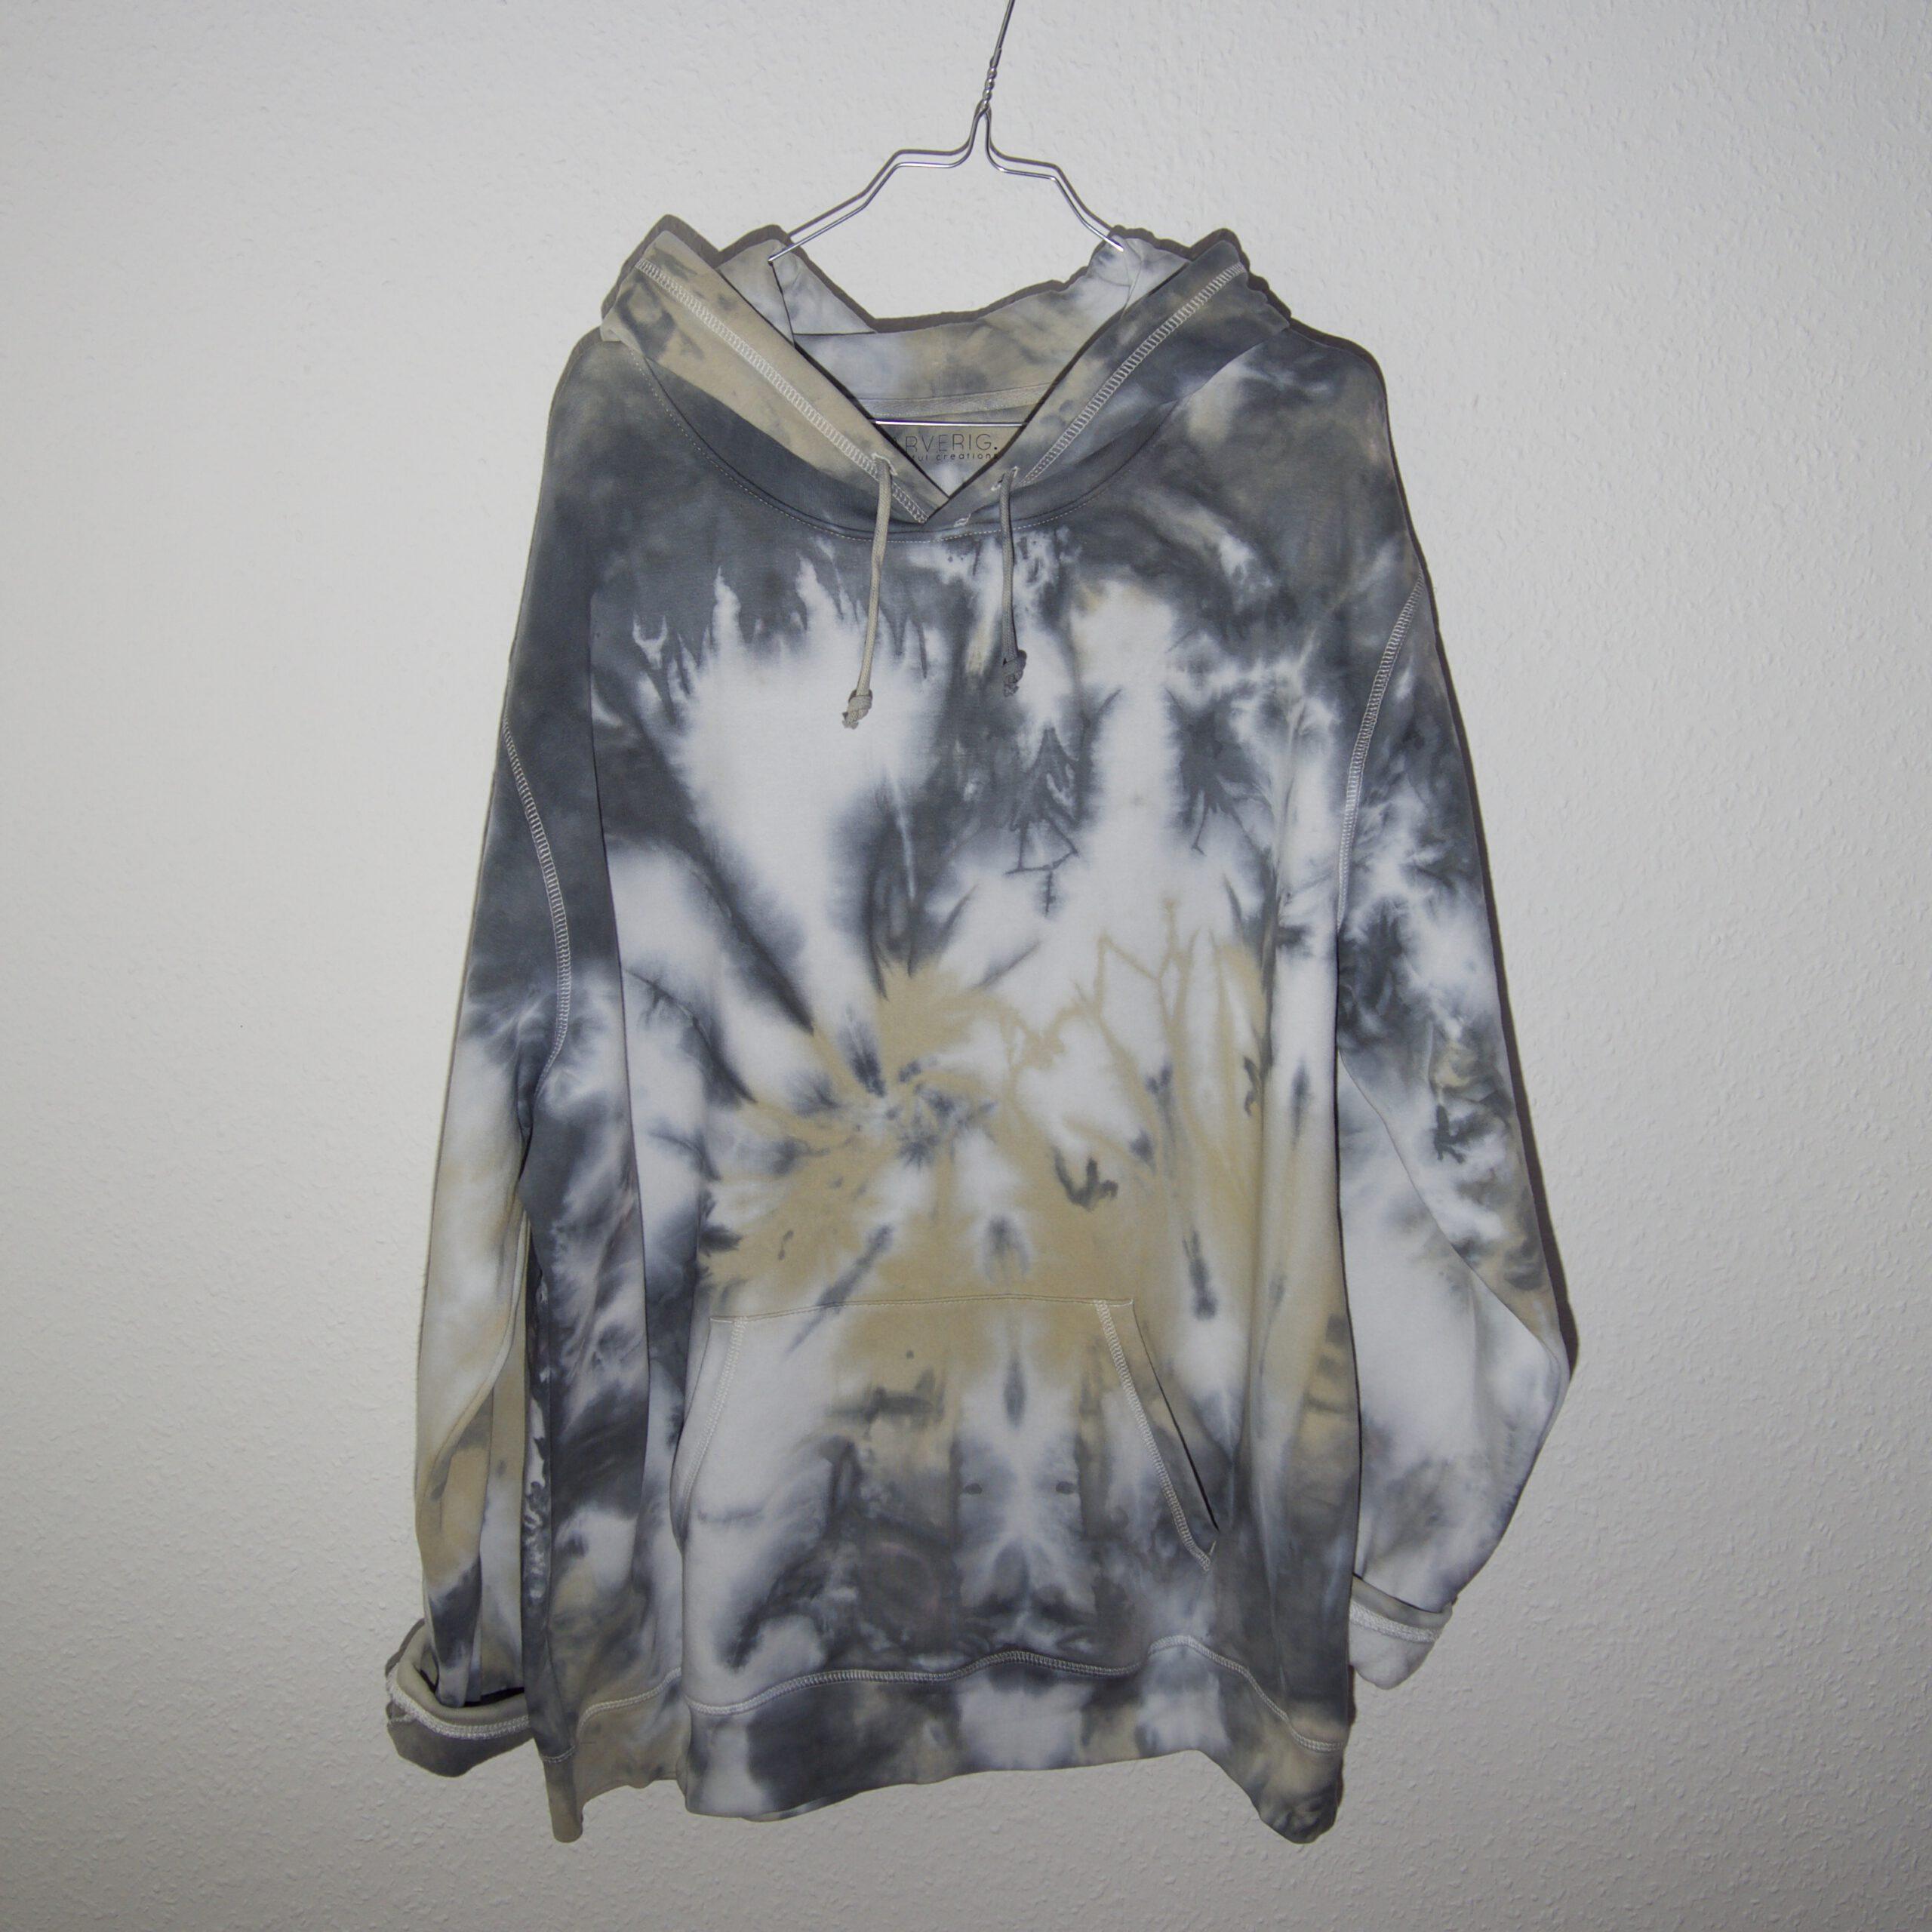 Batik / Tie-Dye Hoodie Thunder – Organic, Handmade